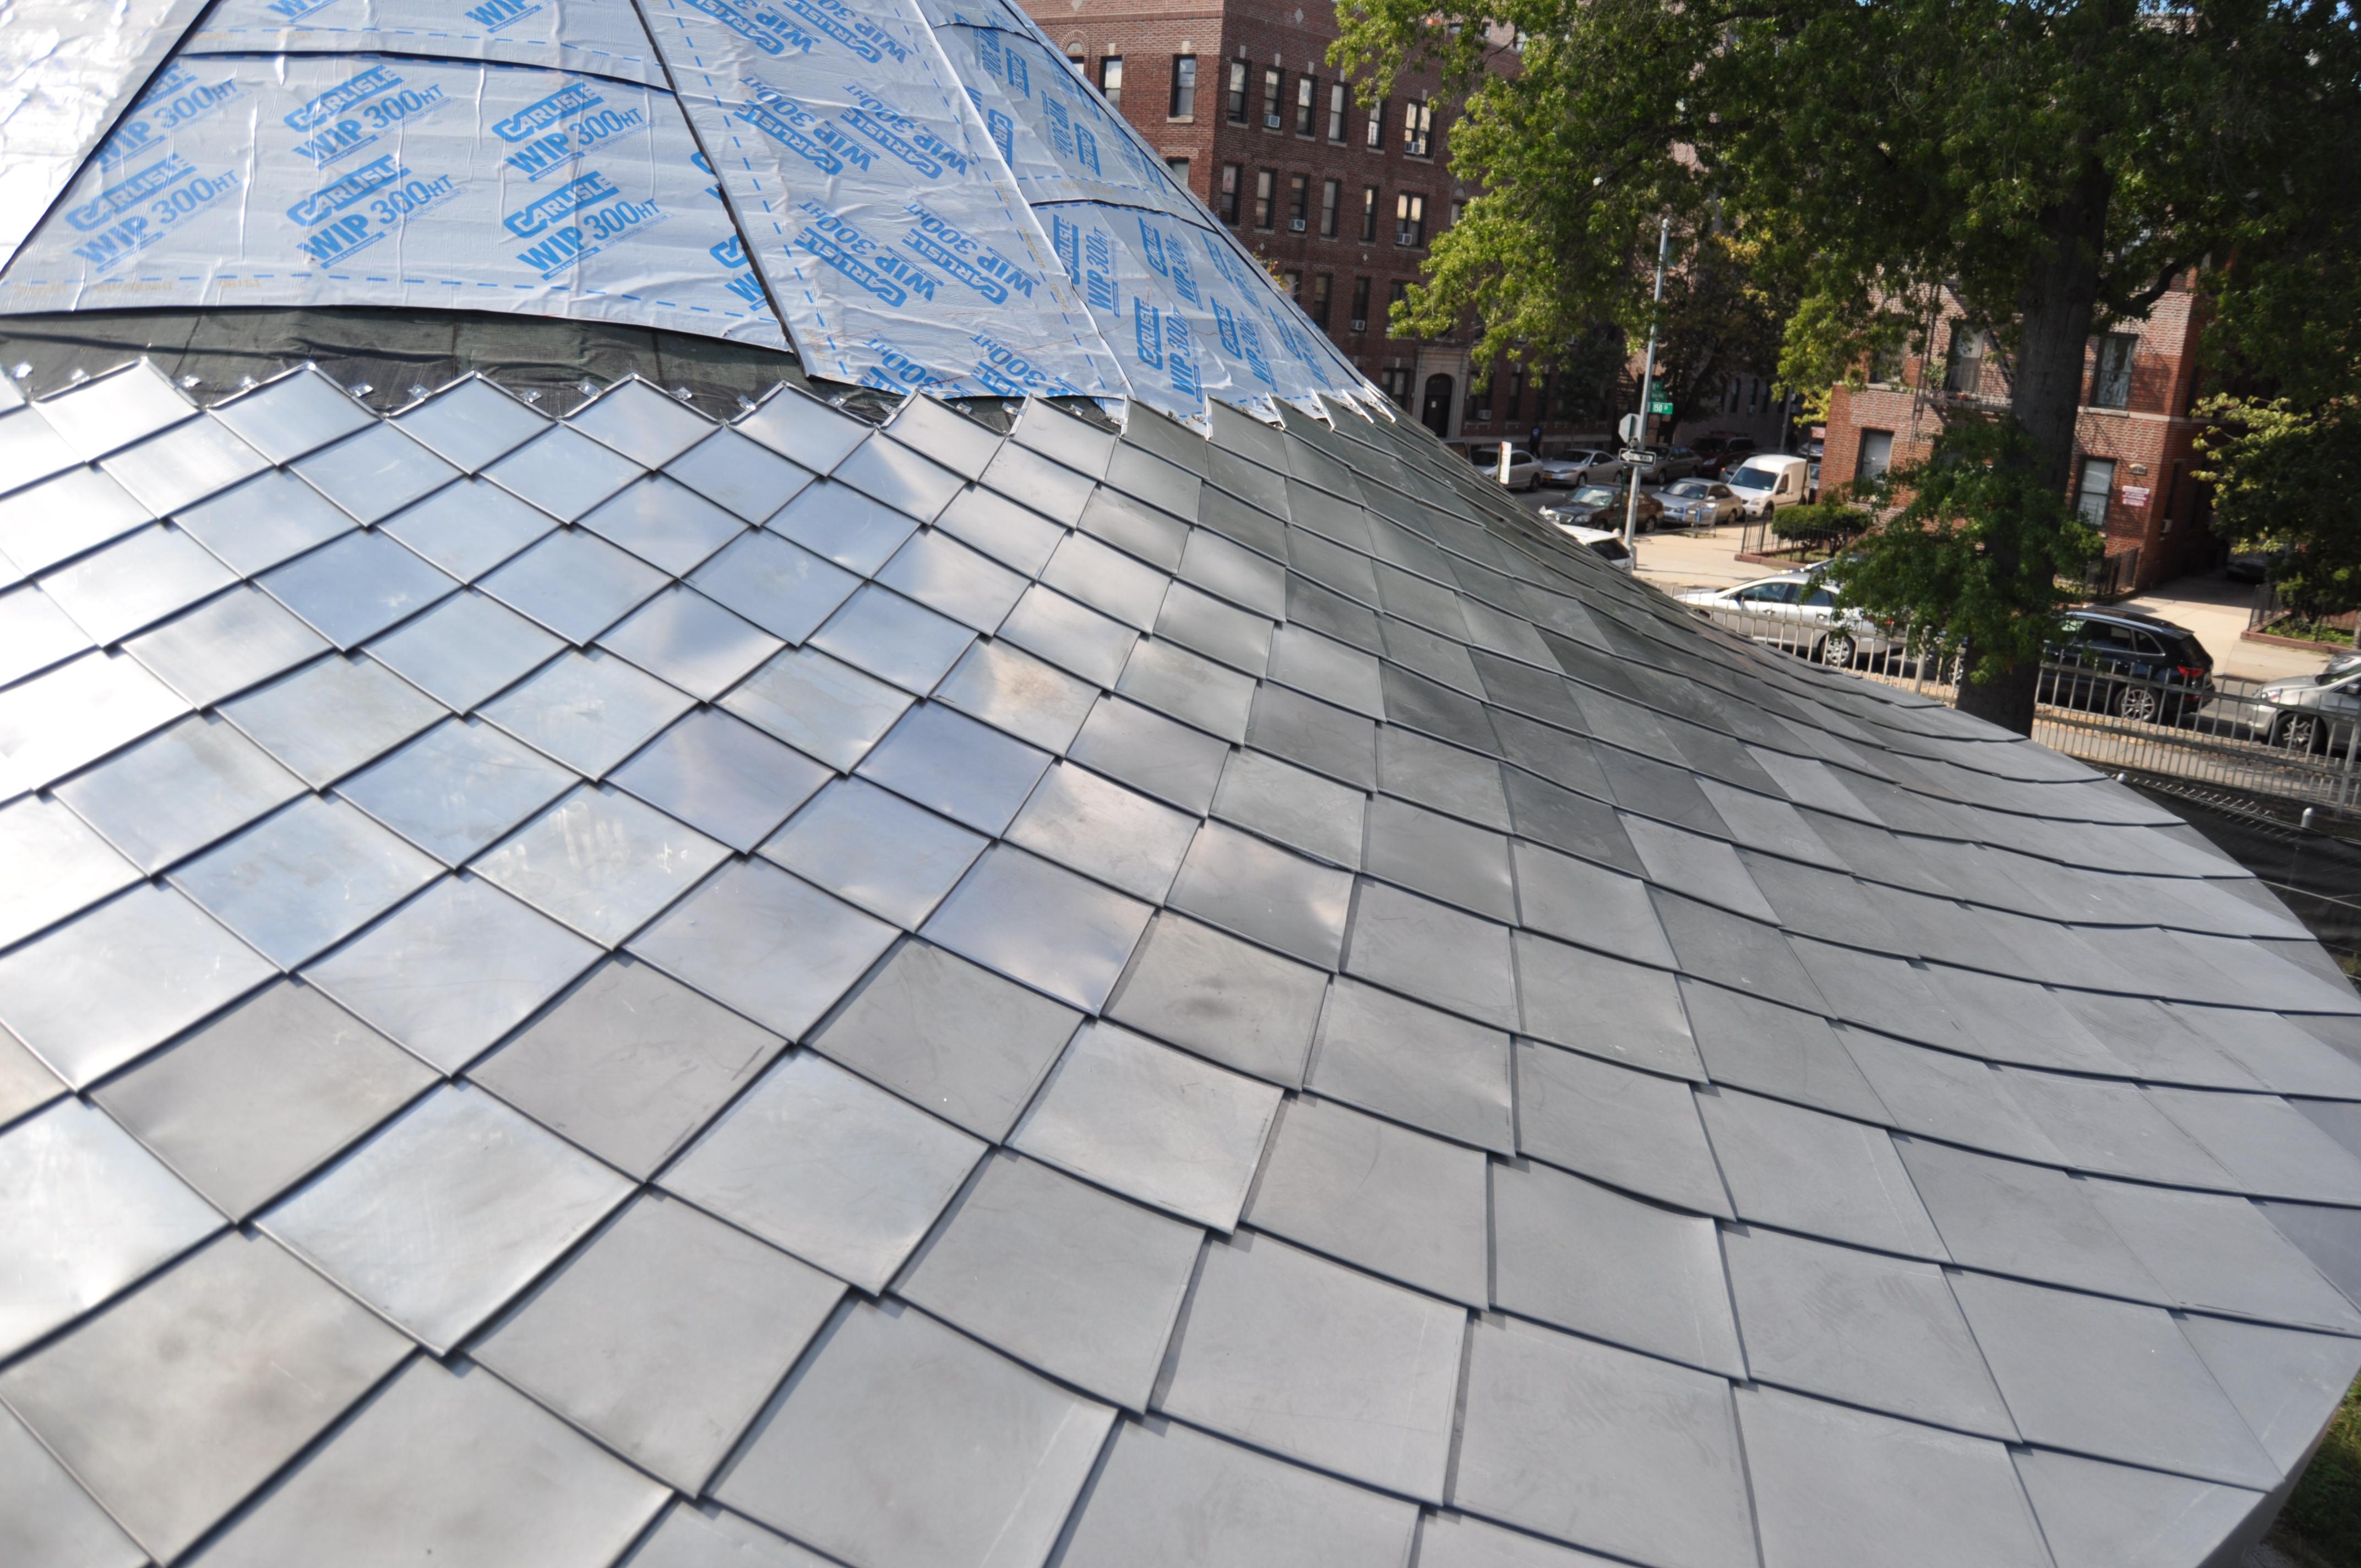 Terne Roof Shingle Turret Fine Metal Roof Tech